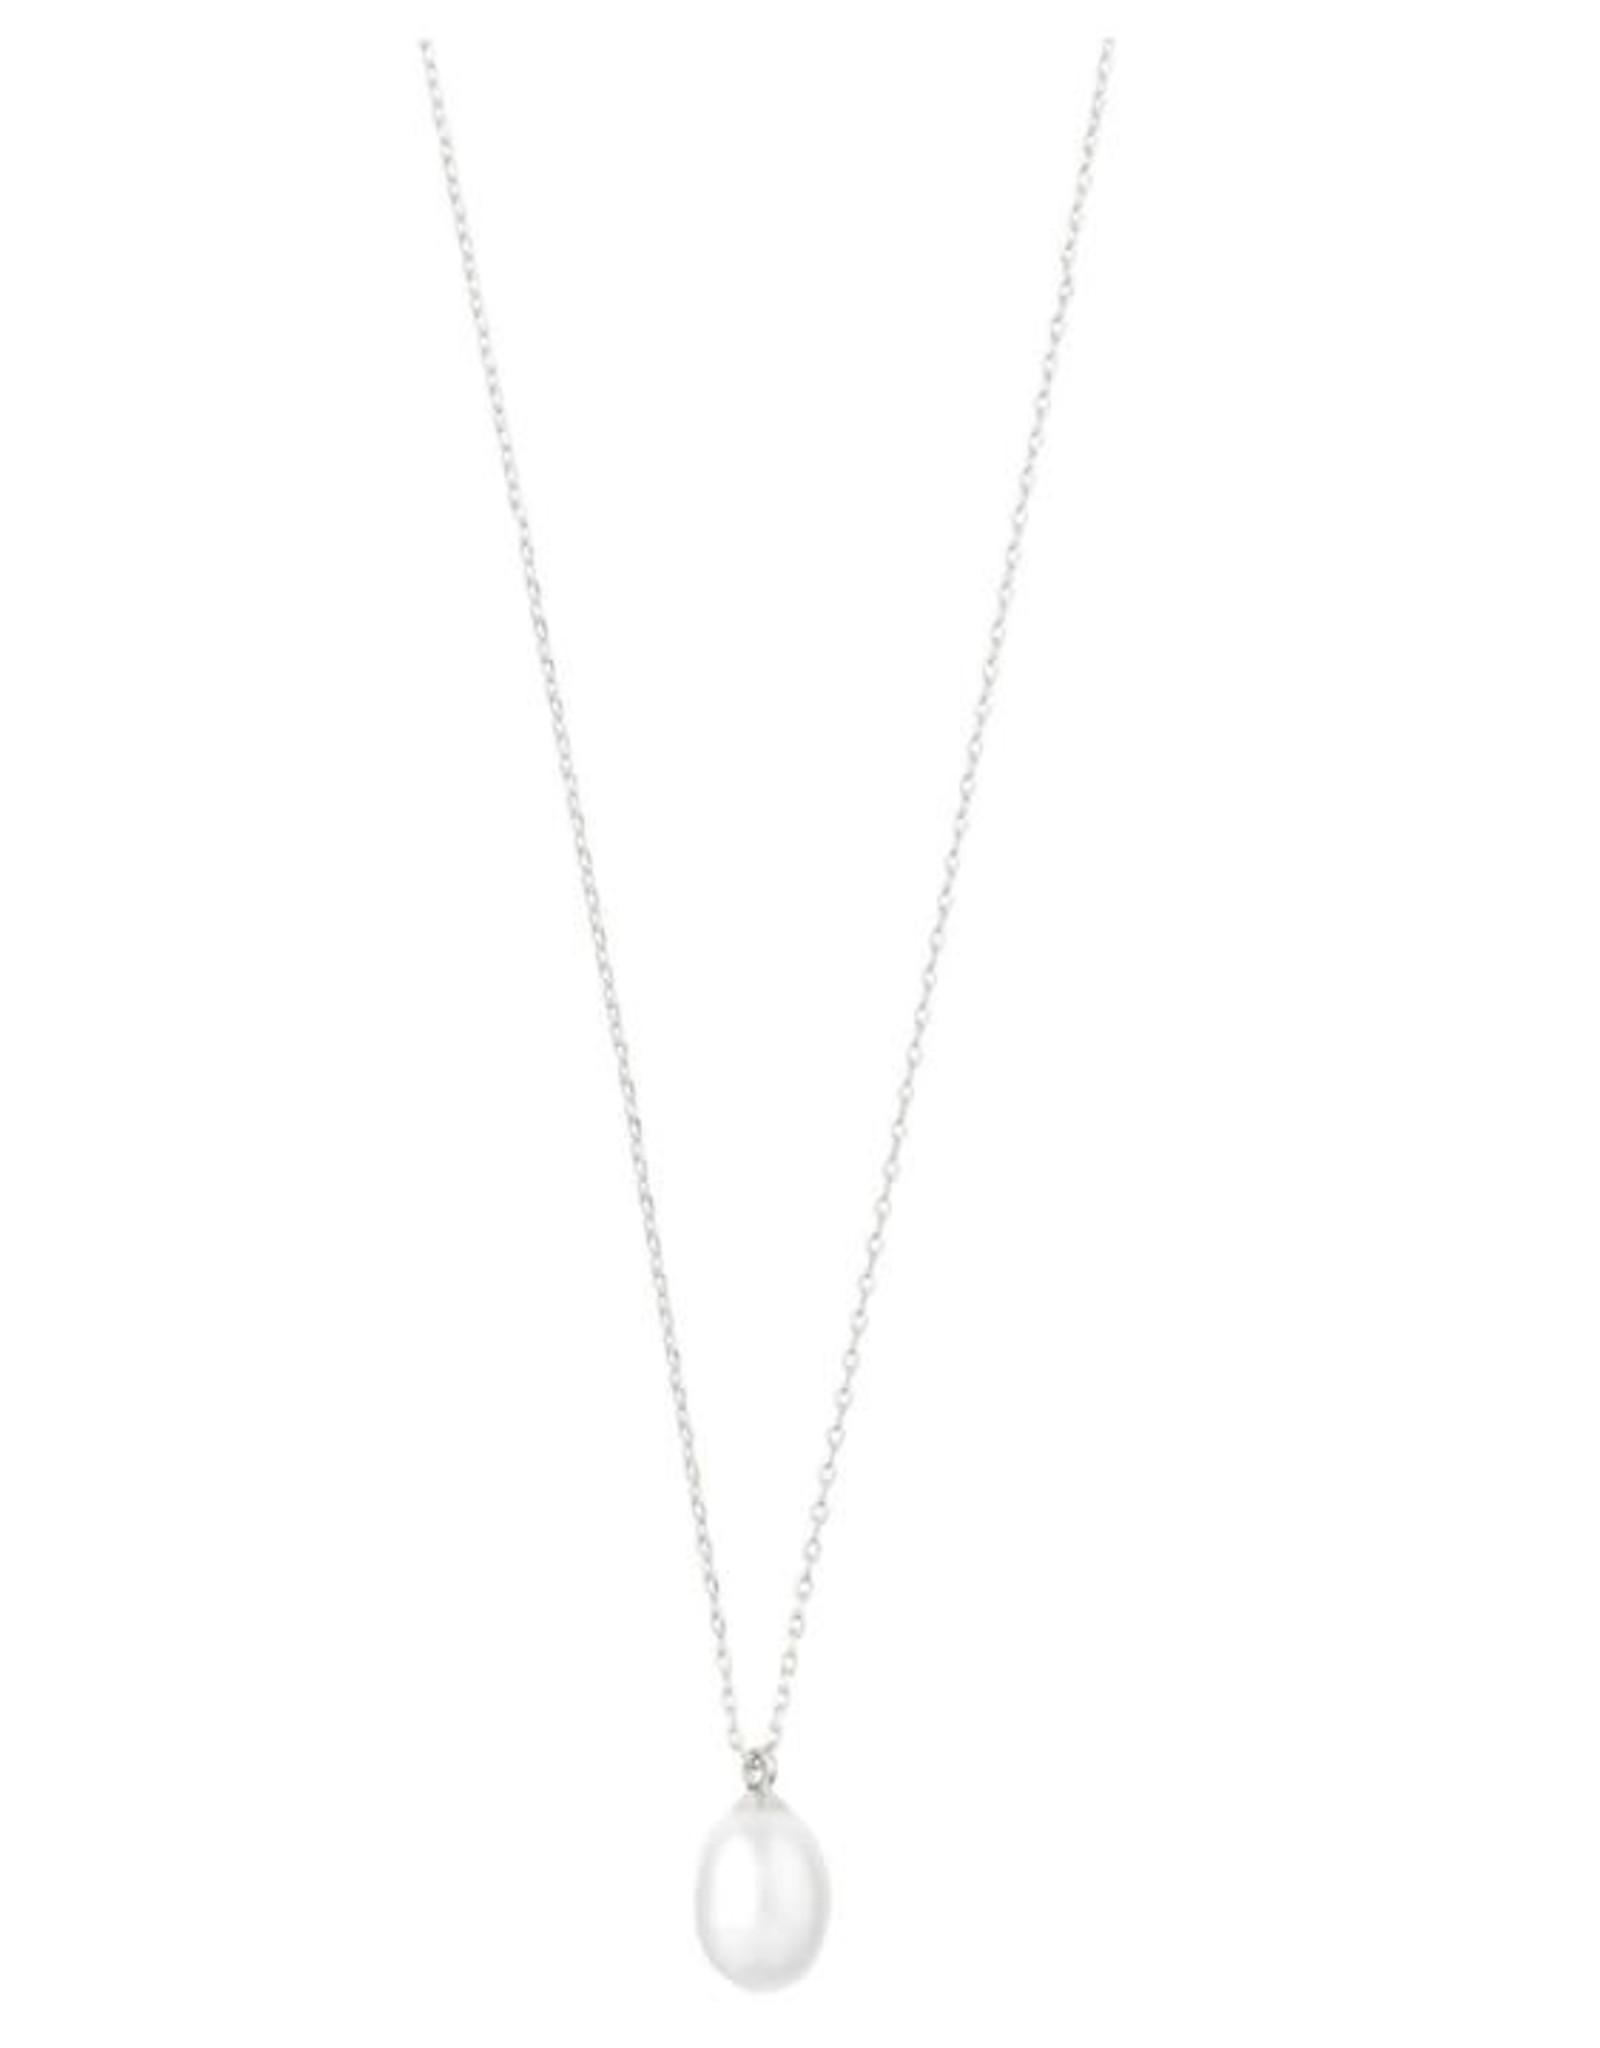 Pilgrim Collier perle blanche - Argent